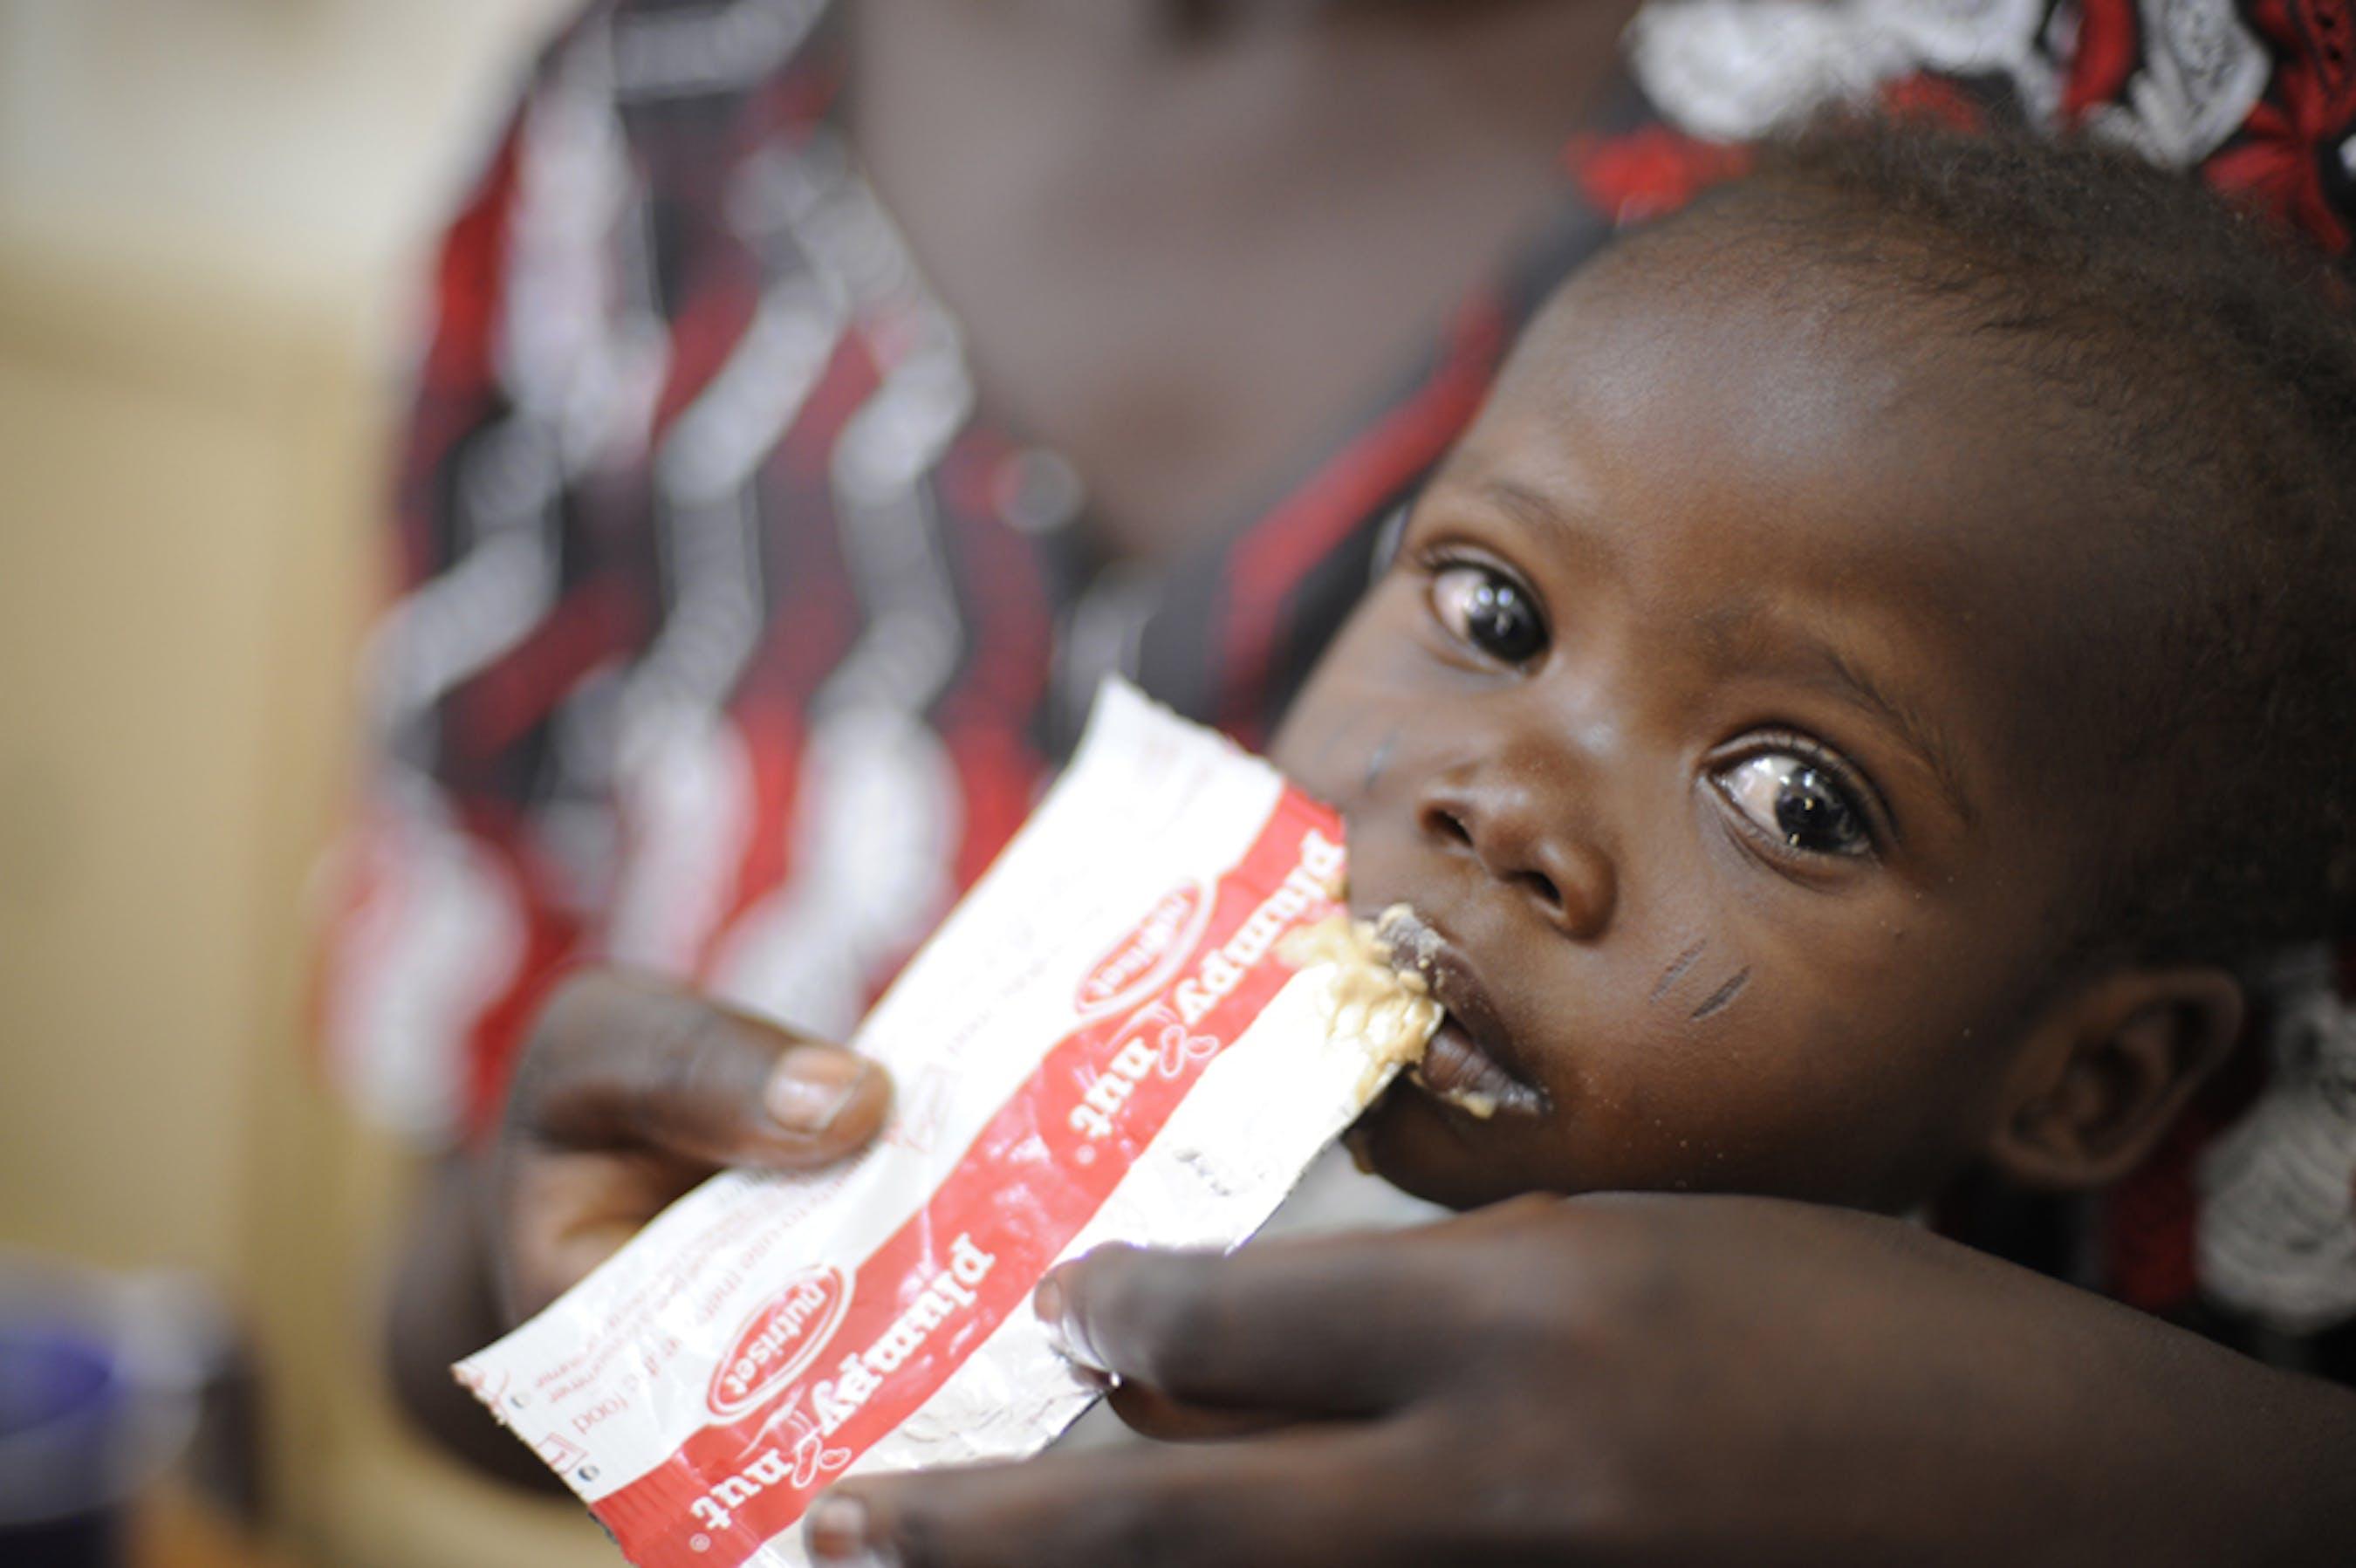 © UNICEF/NYHQ2010-1159/Gangale